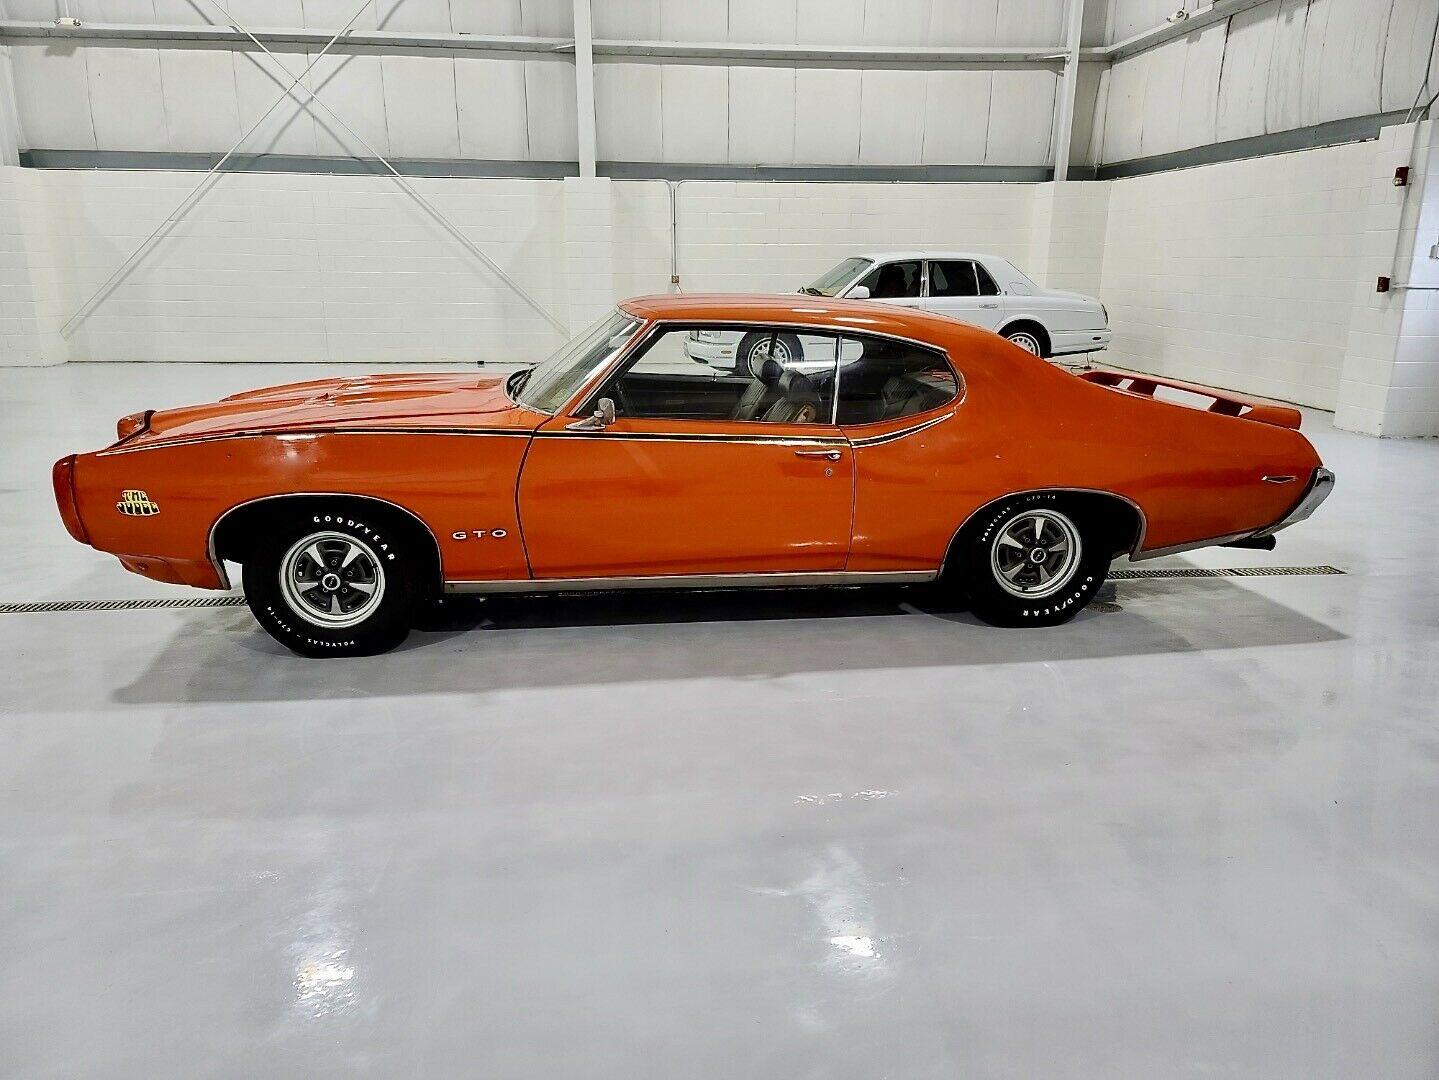 1969 Pontiac Gto Judge With 31k Miles Needs The Finishing Touches Autoevolution